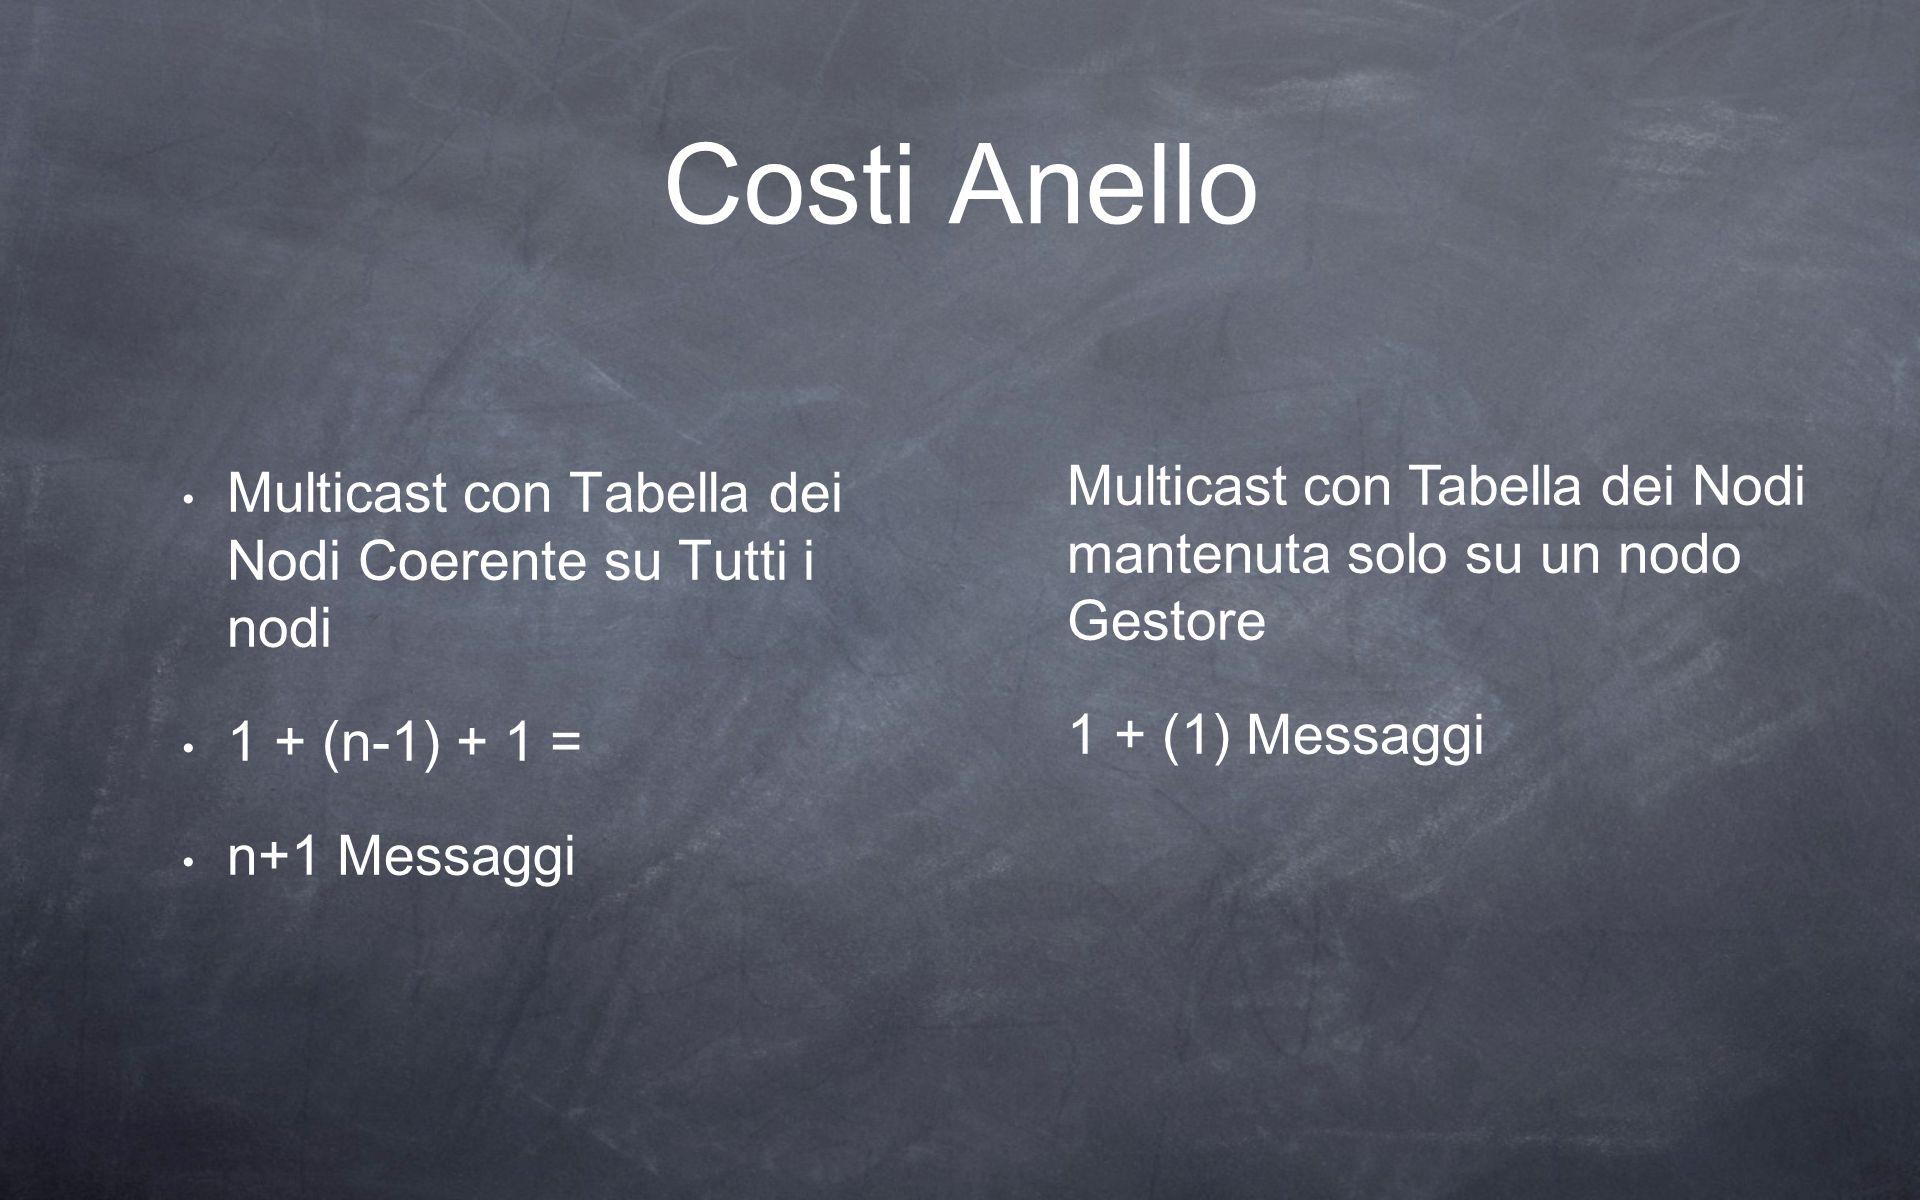 Messaggio - Multicast # # # 0 6 TipoMittenteDestinat.